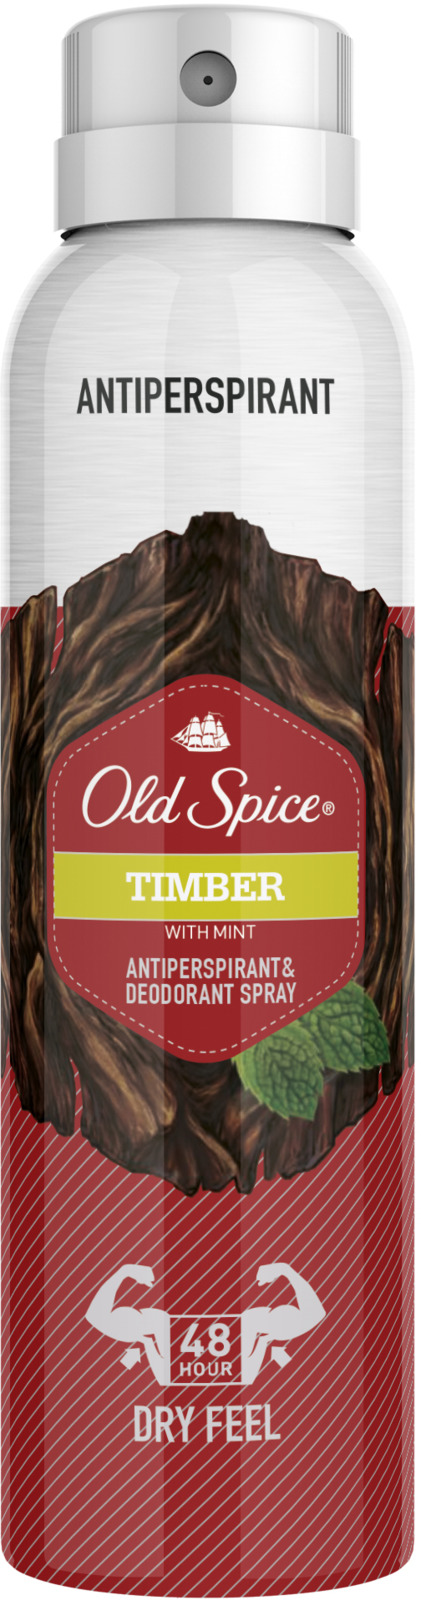 Дезодорант-антиперспирант аэрозольный Old Spice Timber, 150 мл